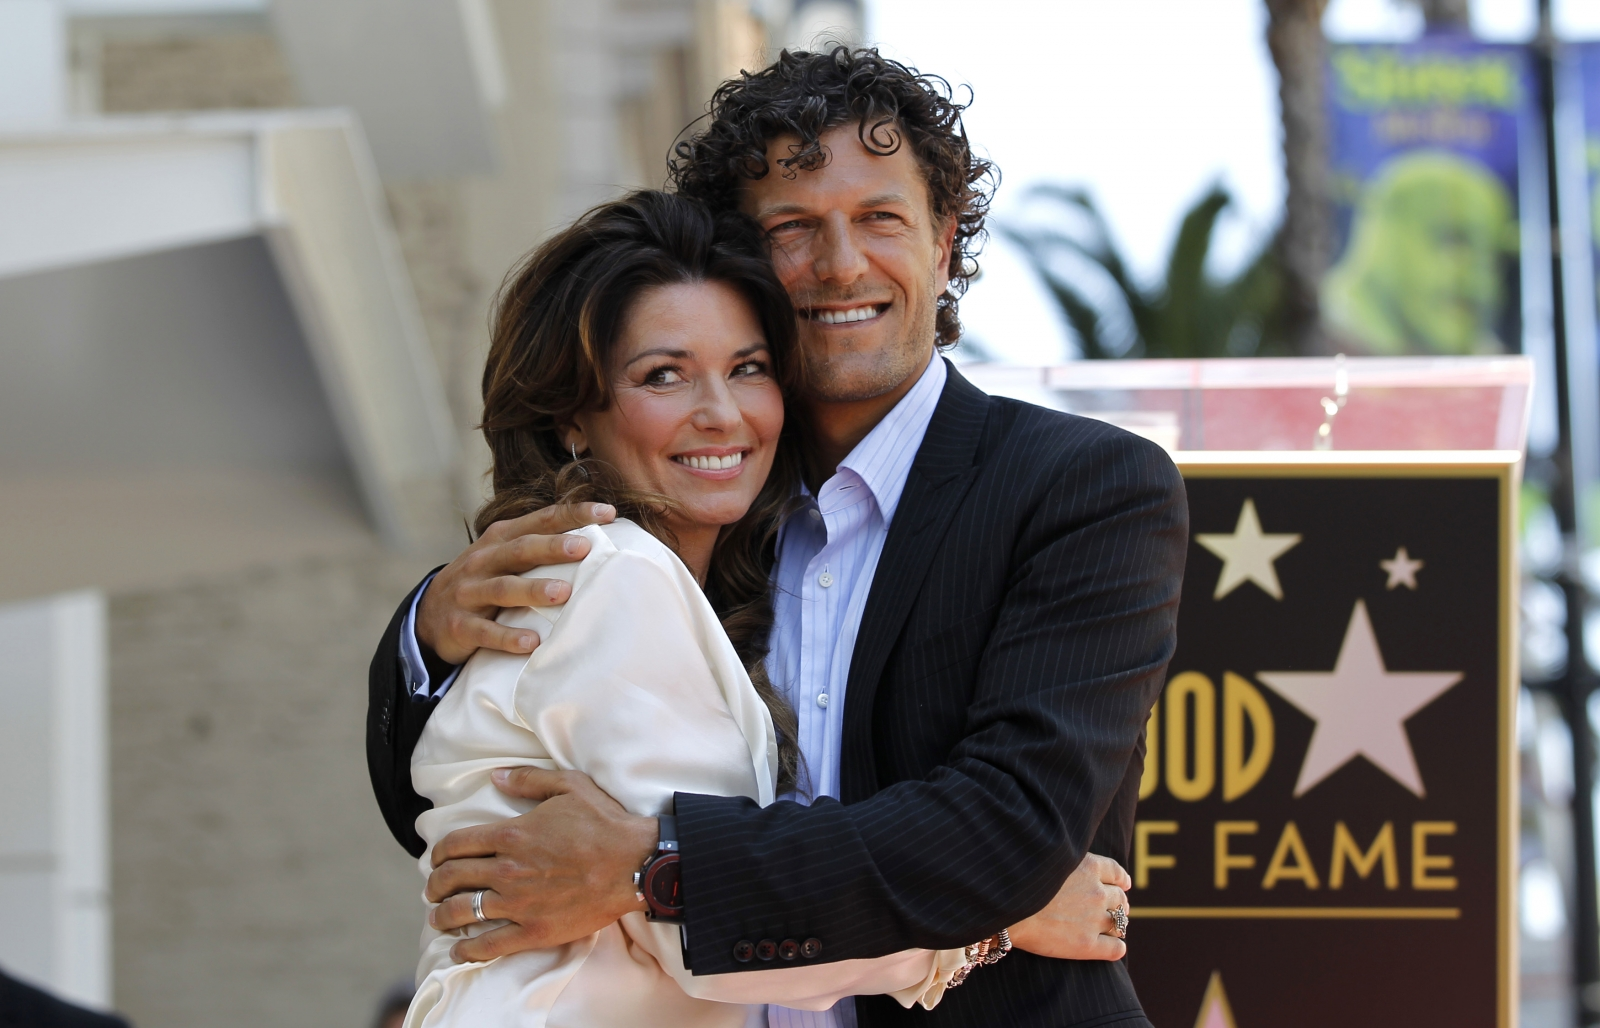 Shania Twain dating Frederic Thiebaud, former husband of ...